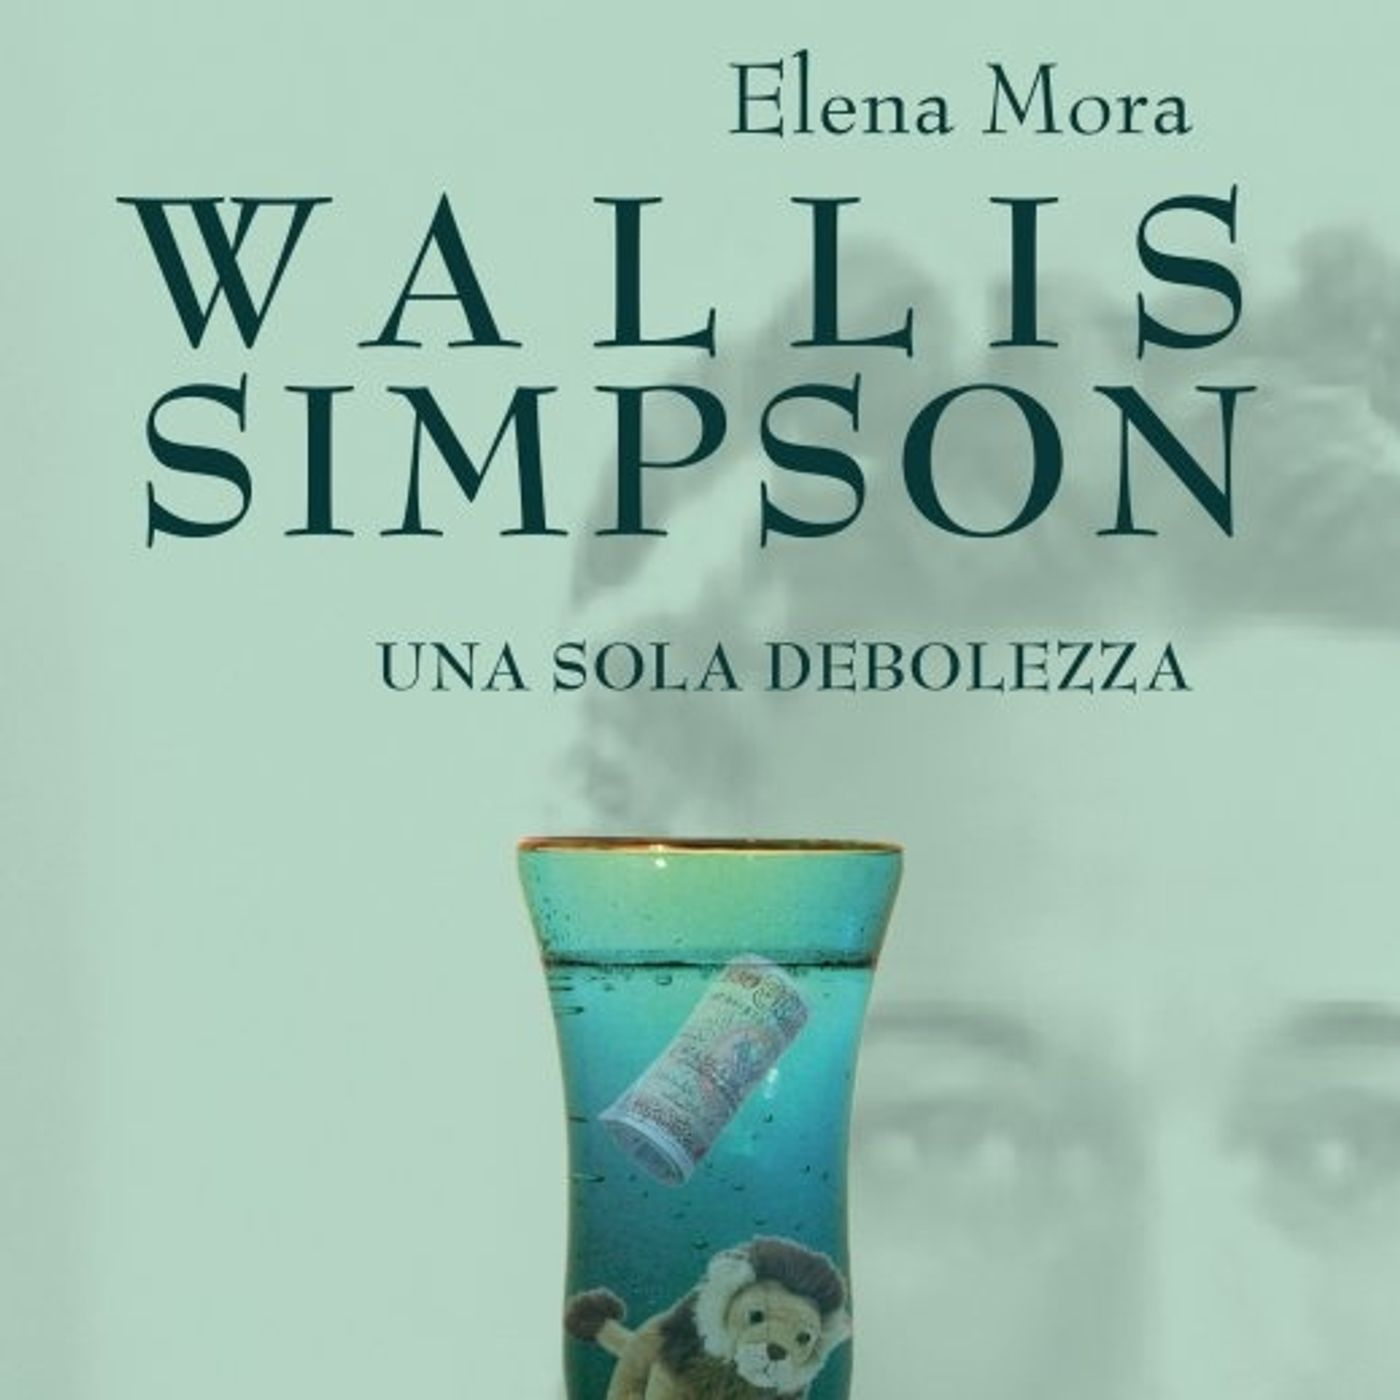 SE4: Ep11. La verità su Wallis Simpson secondo lei